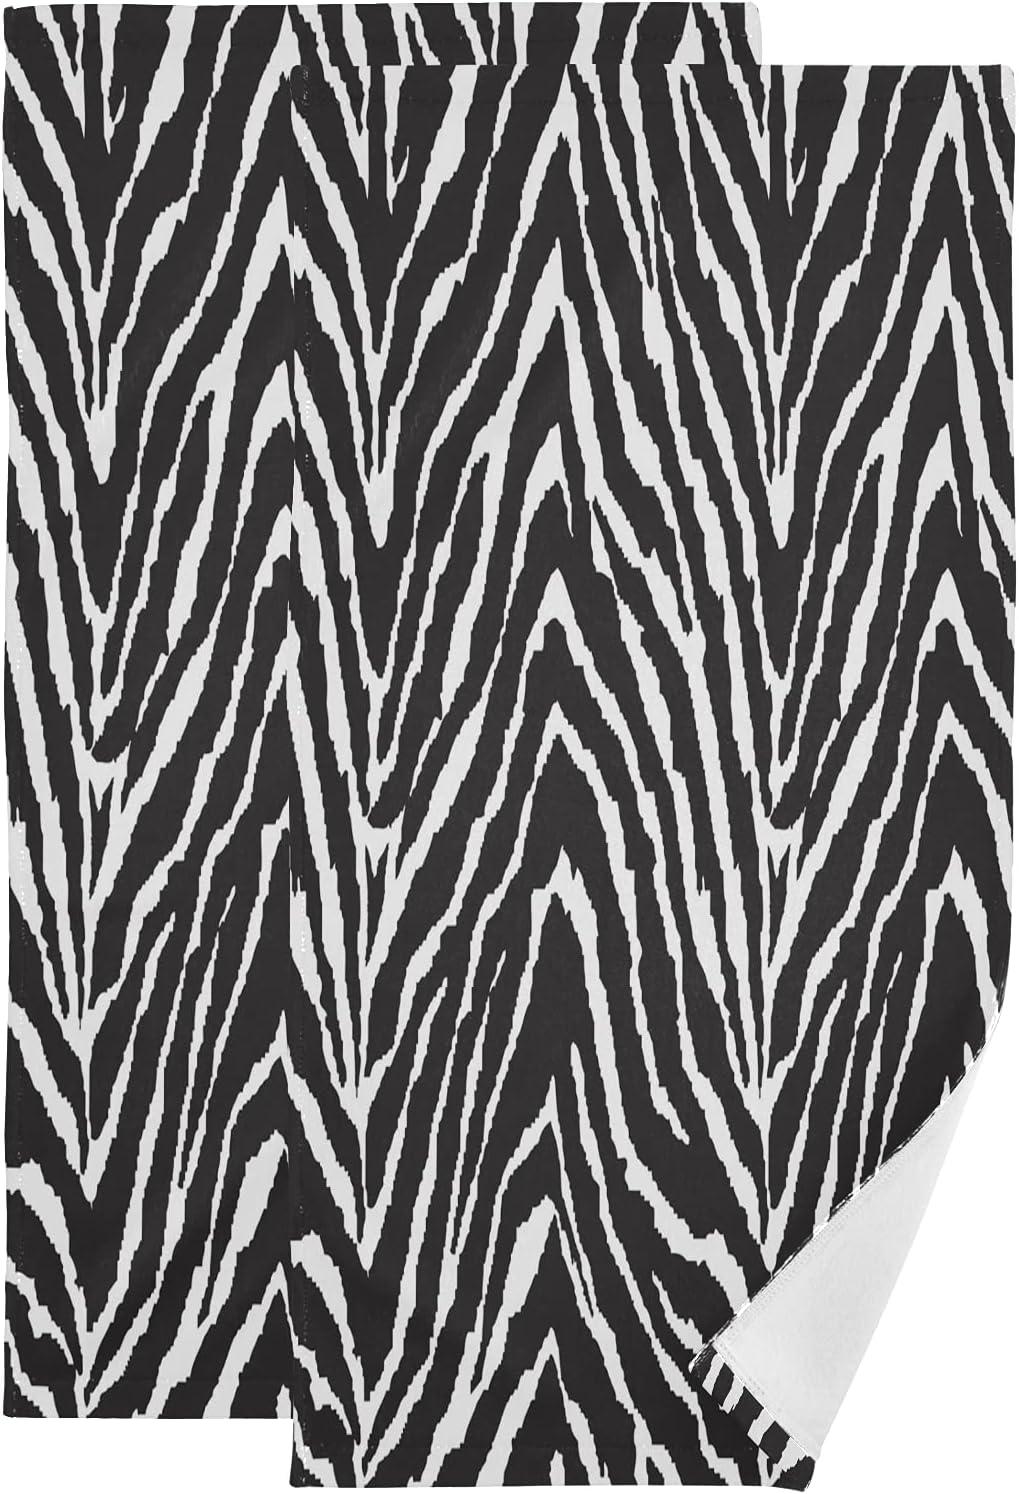 ALAZA Black and White Zebra Print Hand Dec unisex Towels Soft Max 90% OFF Absorbent